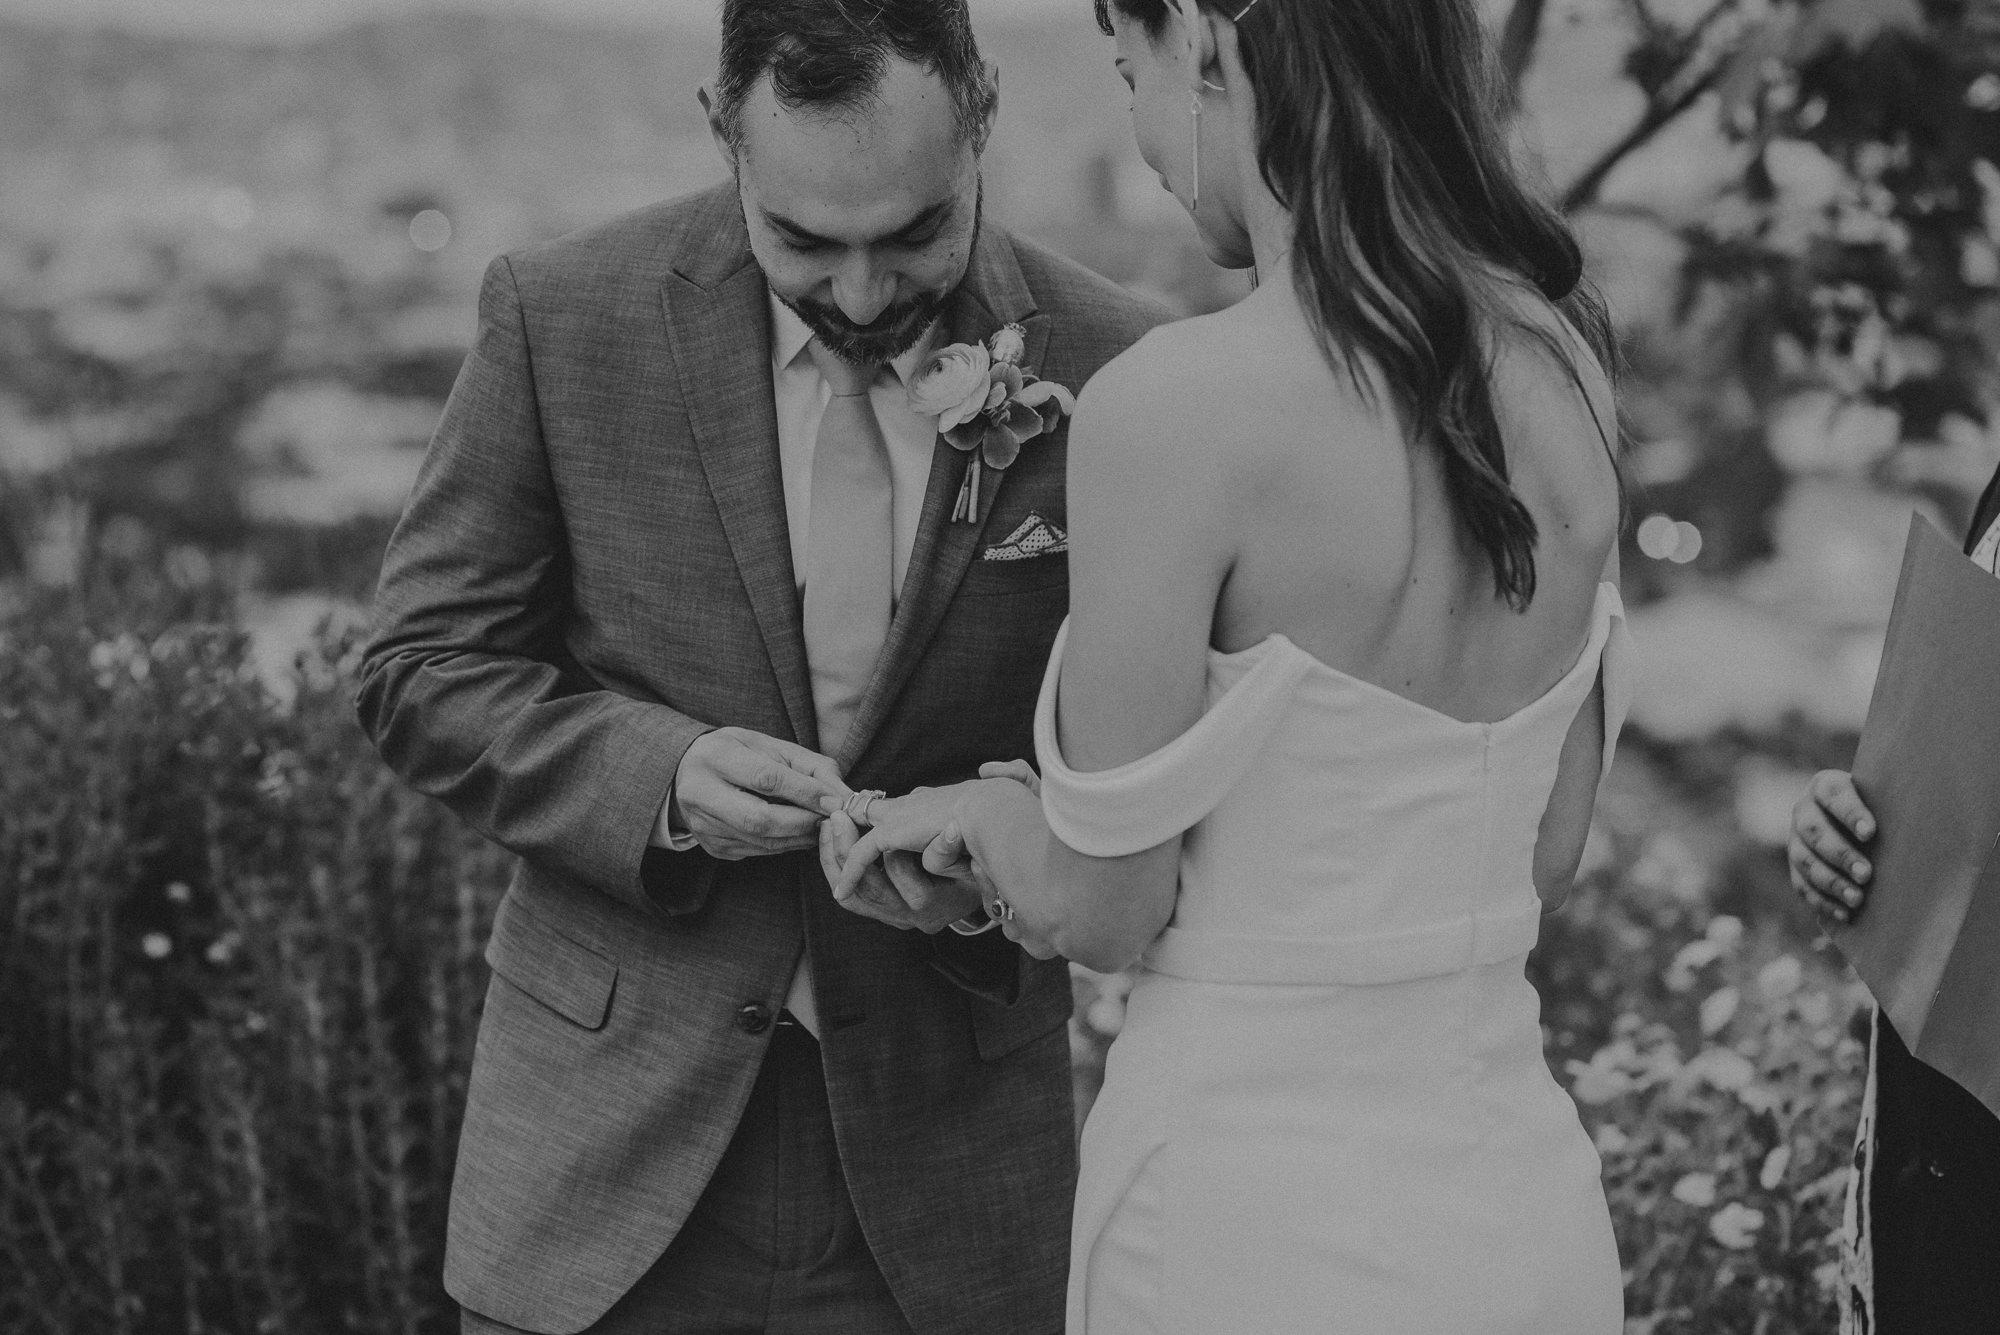 elopement photographer in los angeles - la wedding photographer - isaiahandtaylor.com-063.jpg